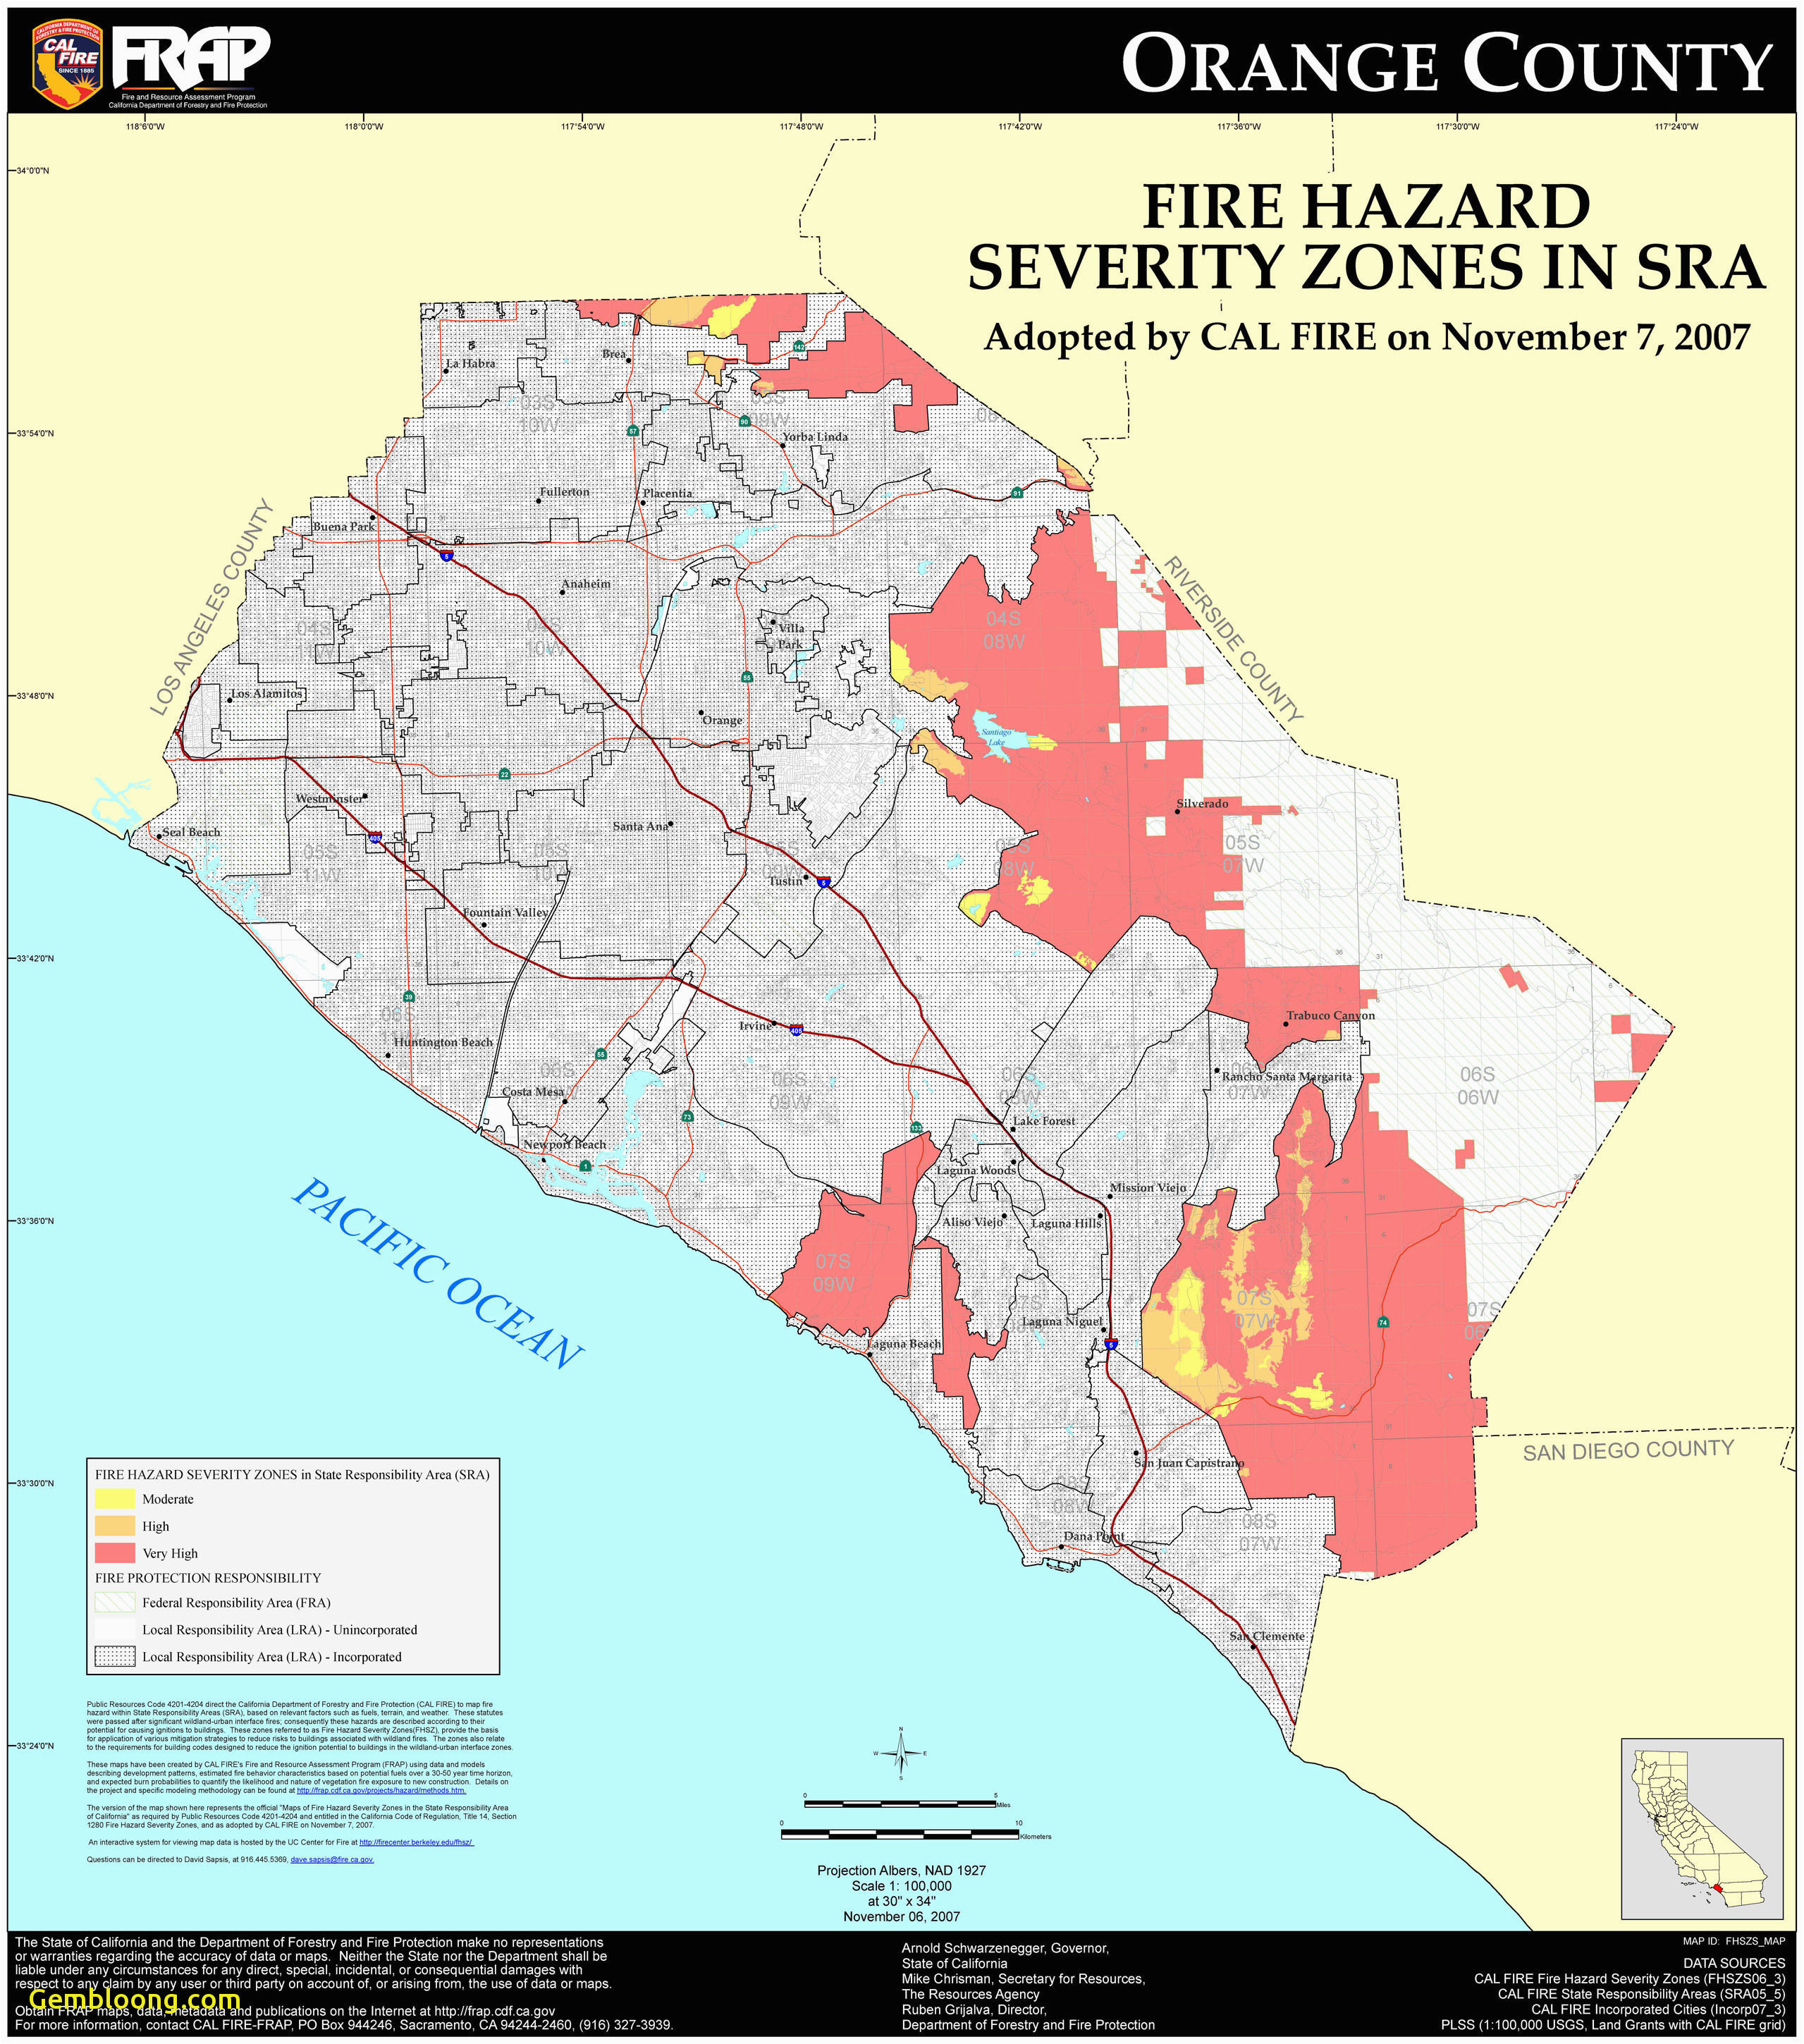 Map Of Zip Codes In California | secretmuseum Zip Code Map California on california map anaheim ca, bakersfield city boundaries map, norcal california map, california map of menifee ca, zip codes by city map, california state code, california map san pedro ca, california county map, california zones, modesto california map, northern california map, california zoning map, california zip code list, california truck route map, fresno county boundary map, california map by zip, california area code map, zip codes county map, california neighborhood map, winchester va zip codes map,